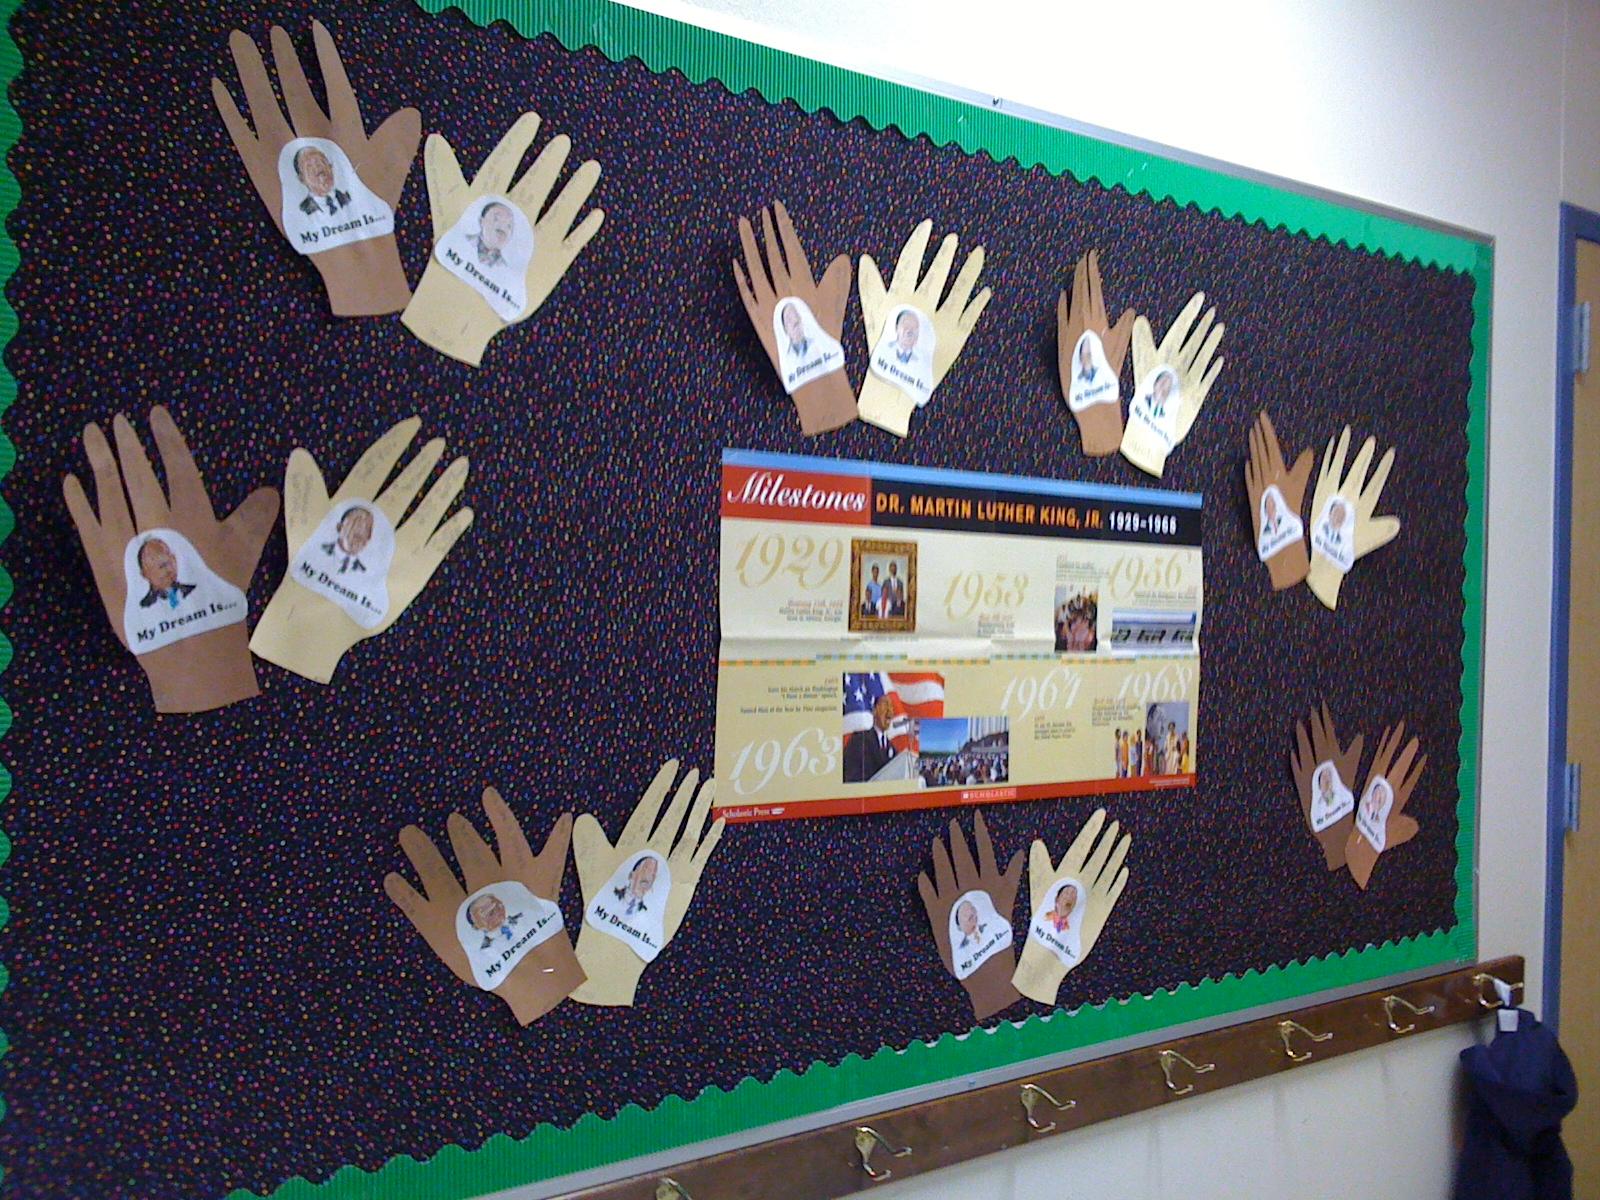 Bishop S Blackboard An Elementary Education Blog Hand In